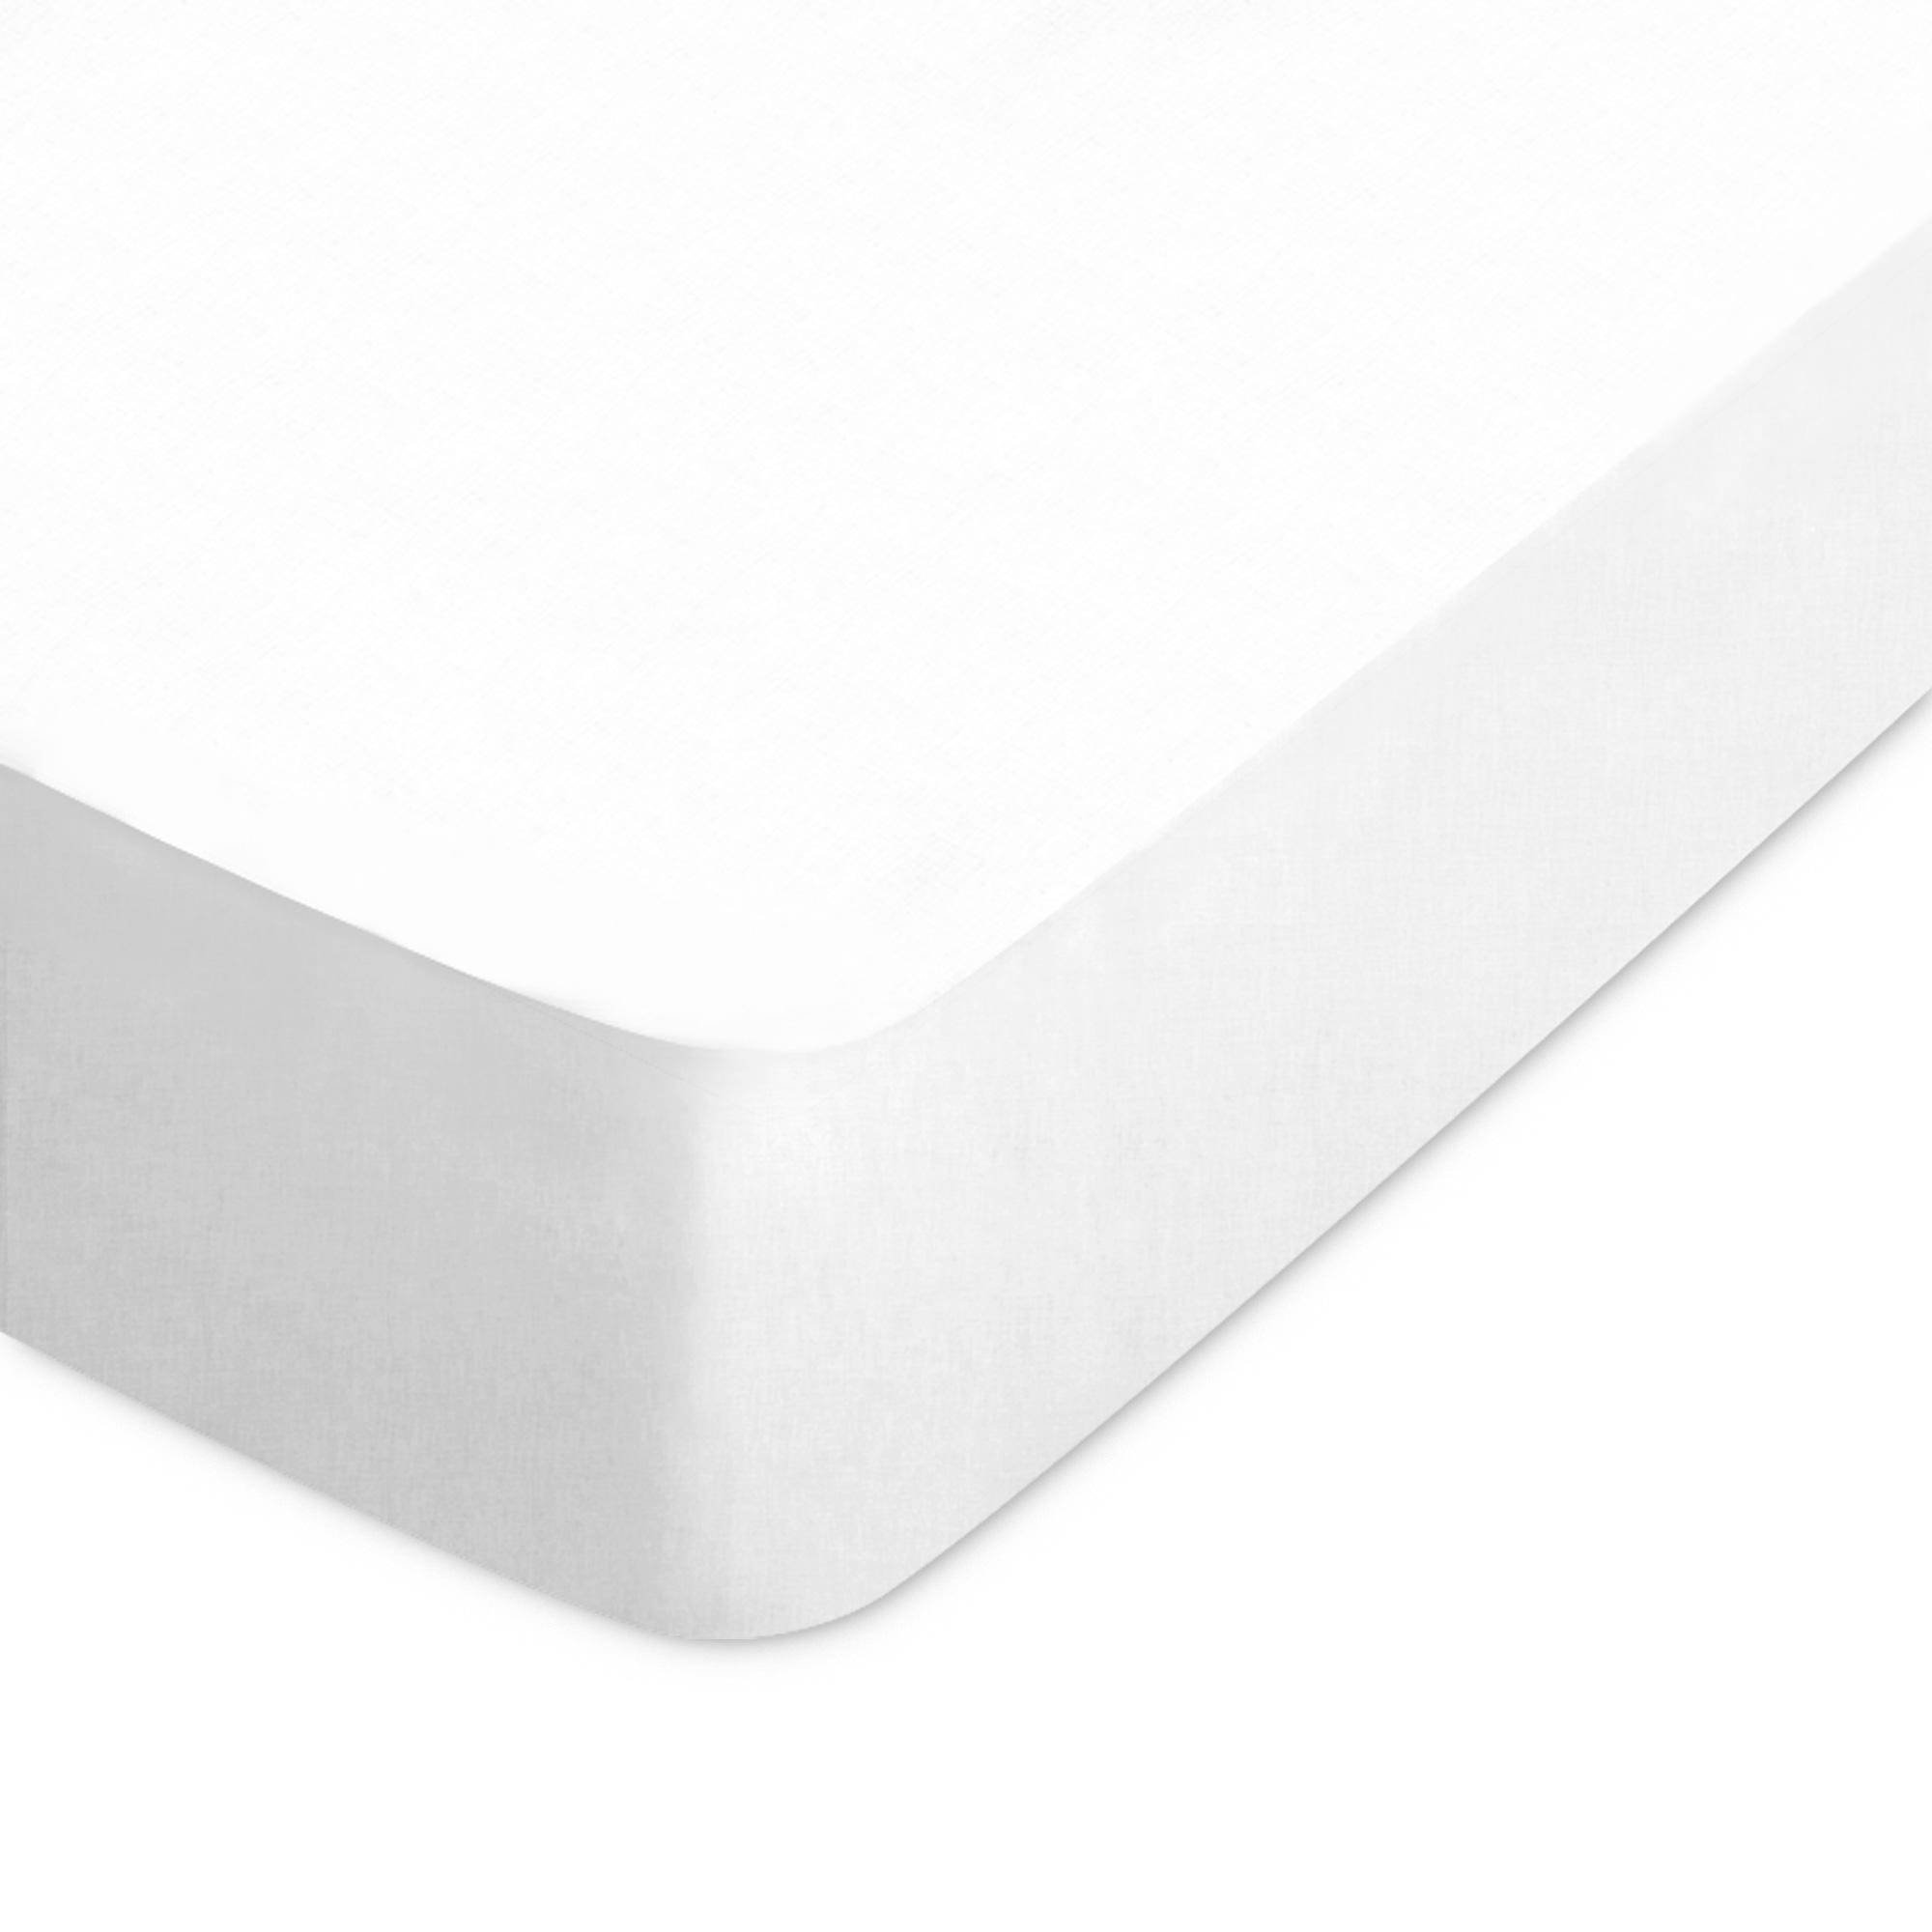 Linnea Drap housse uni 220x190 cm 100% coton ALTO Blanc